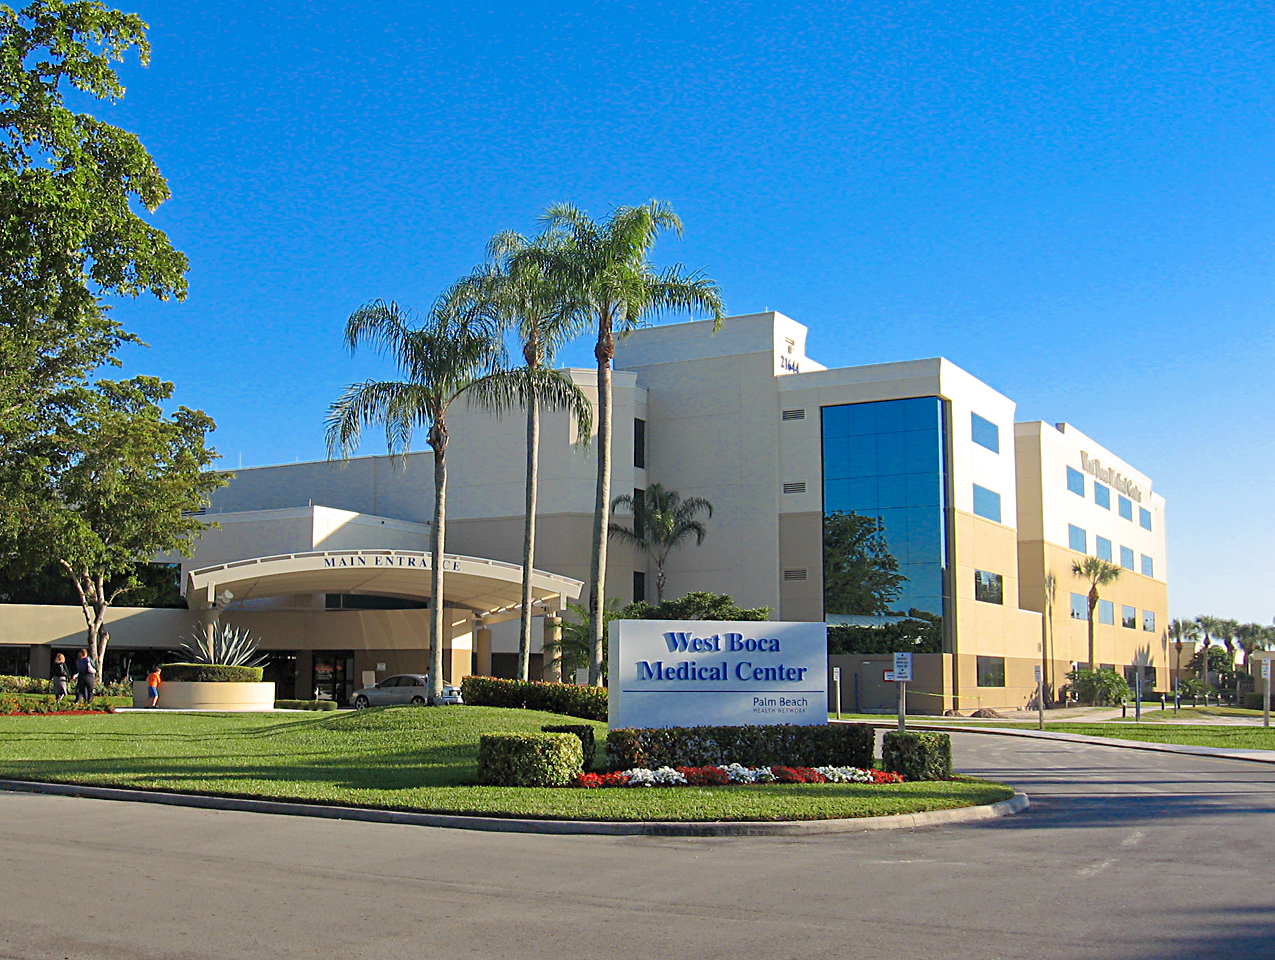 West Boca Medical Center NICU